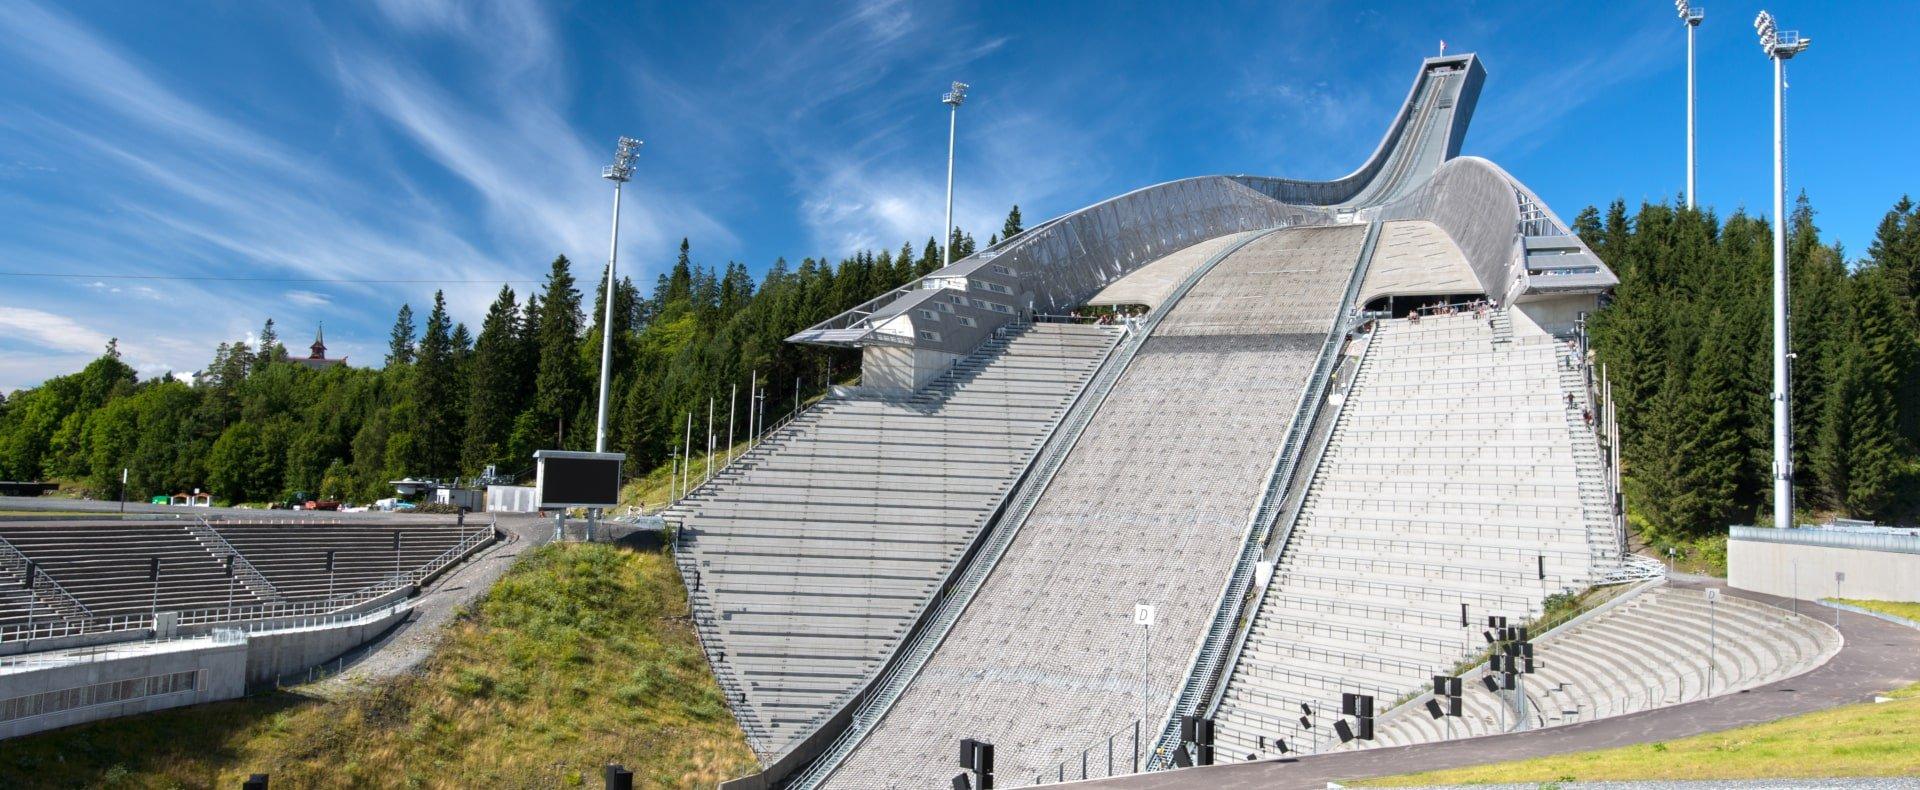 Ski Jump Museum, Oslo, Norway